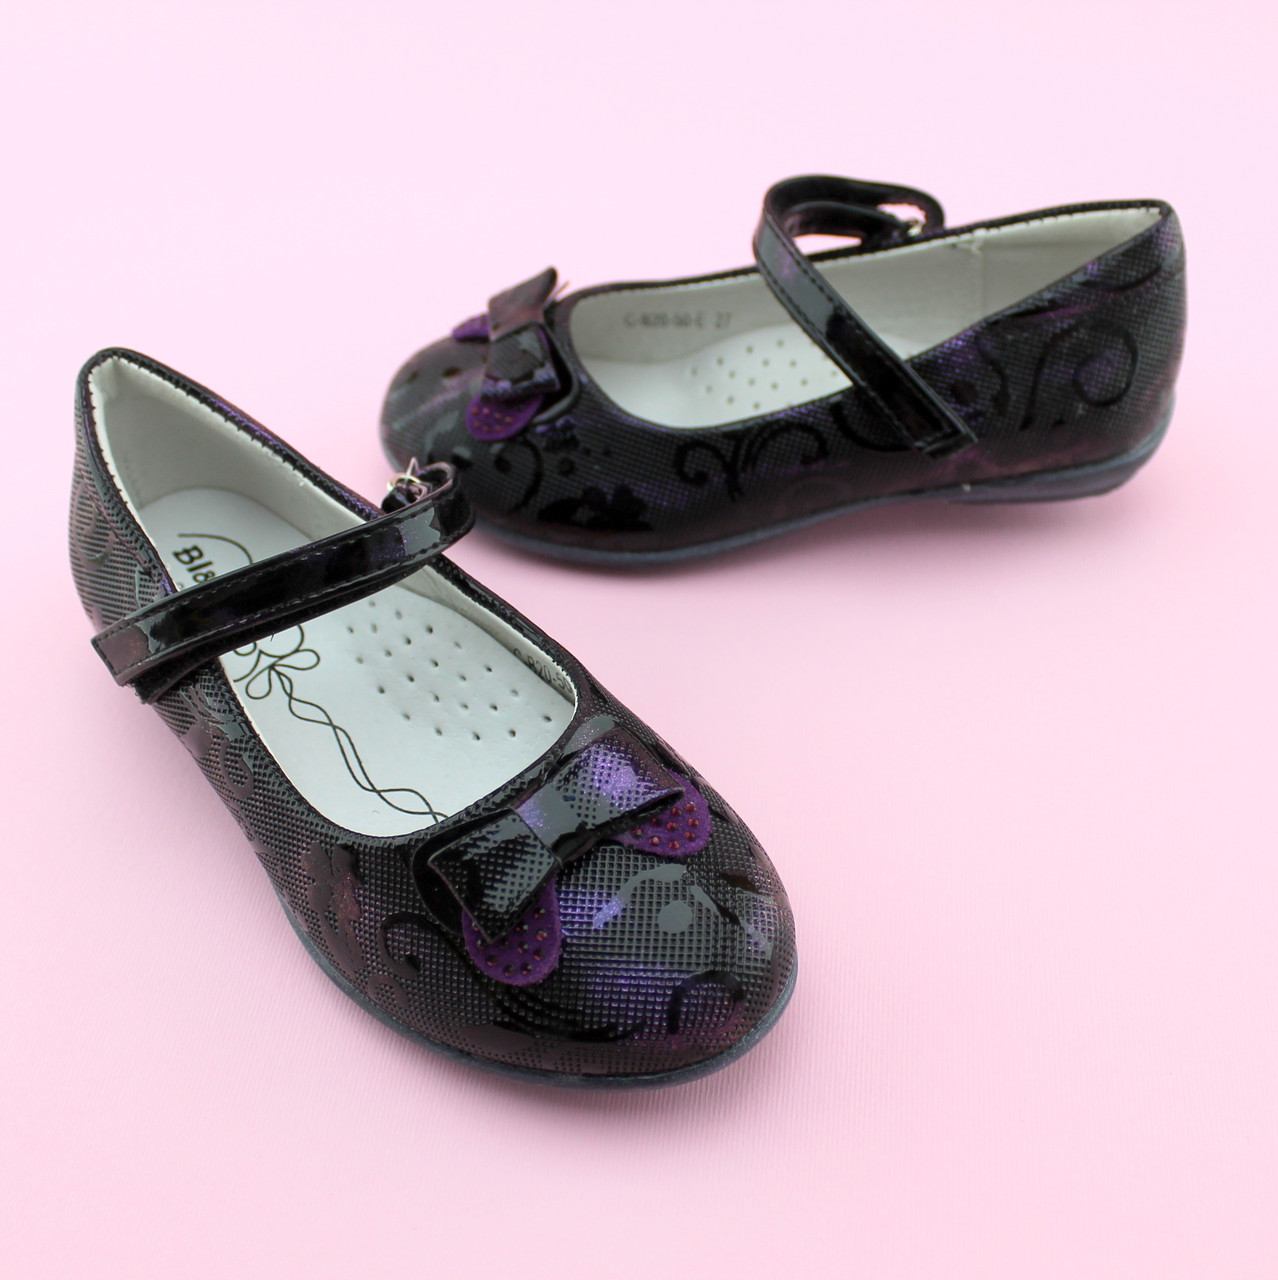 Туфли для девочки Фиолетовые тм BI&KI размер 27,28,29,30,31,32